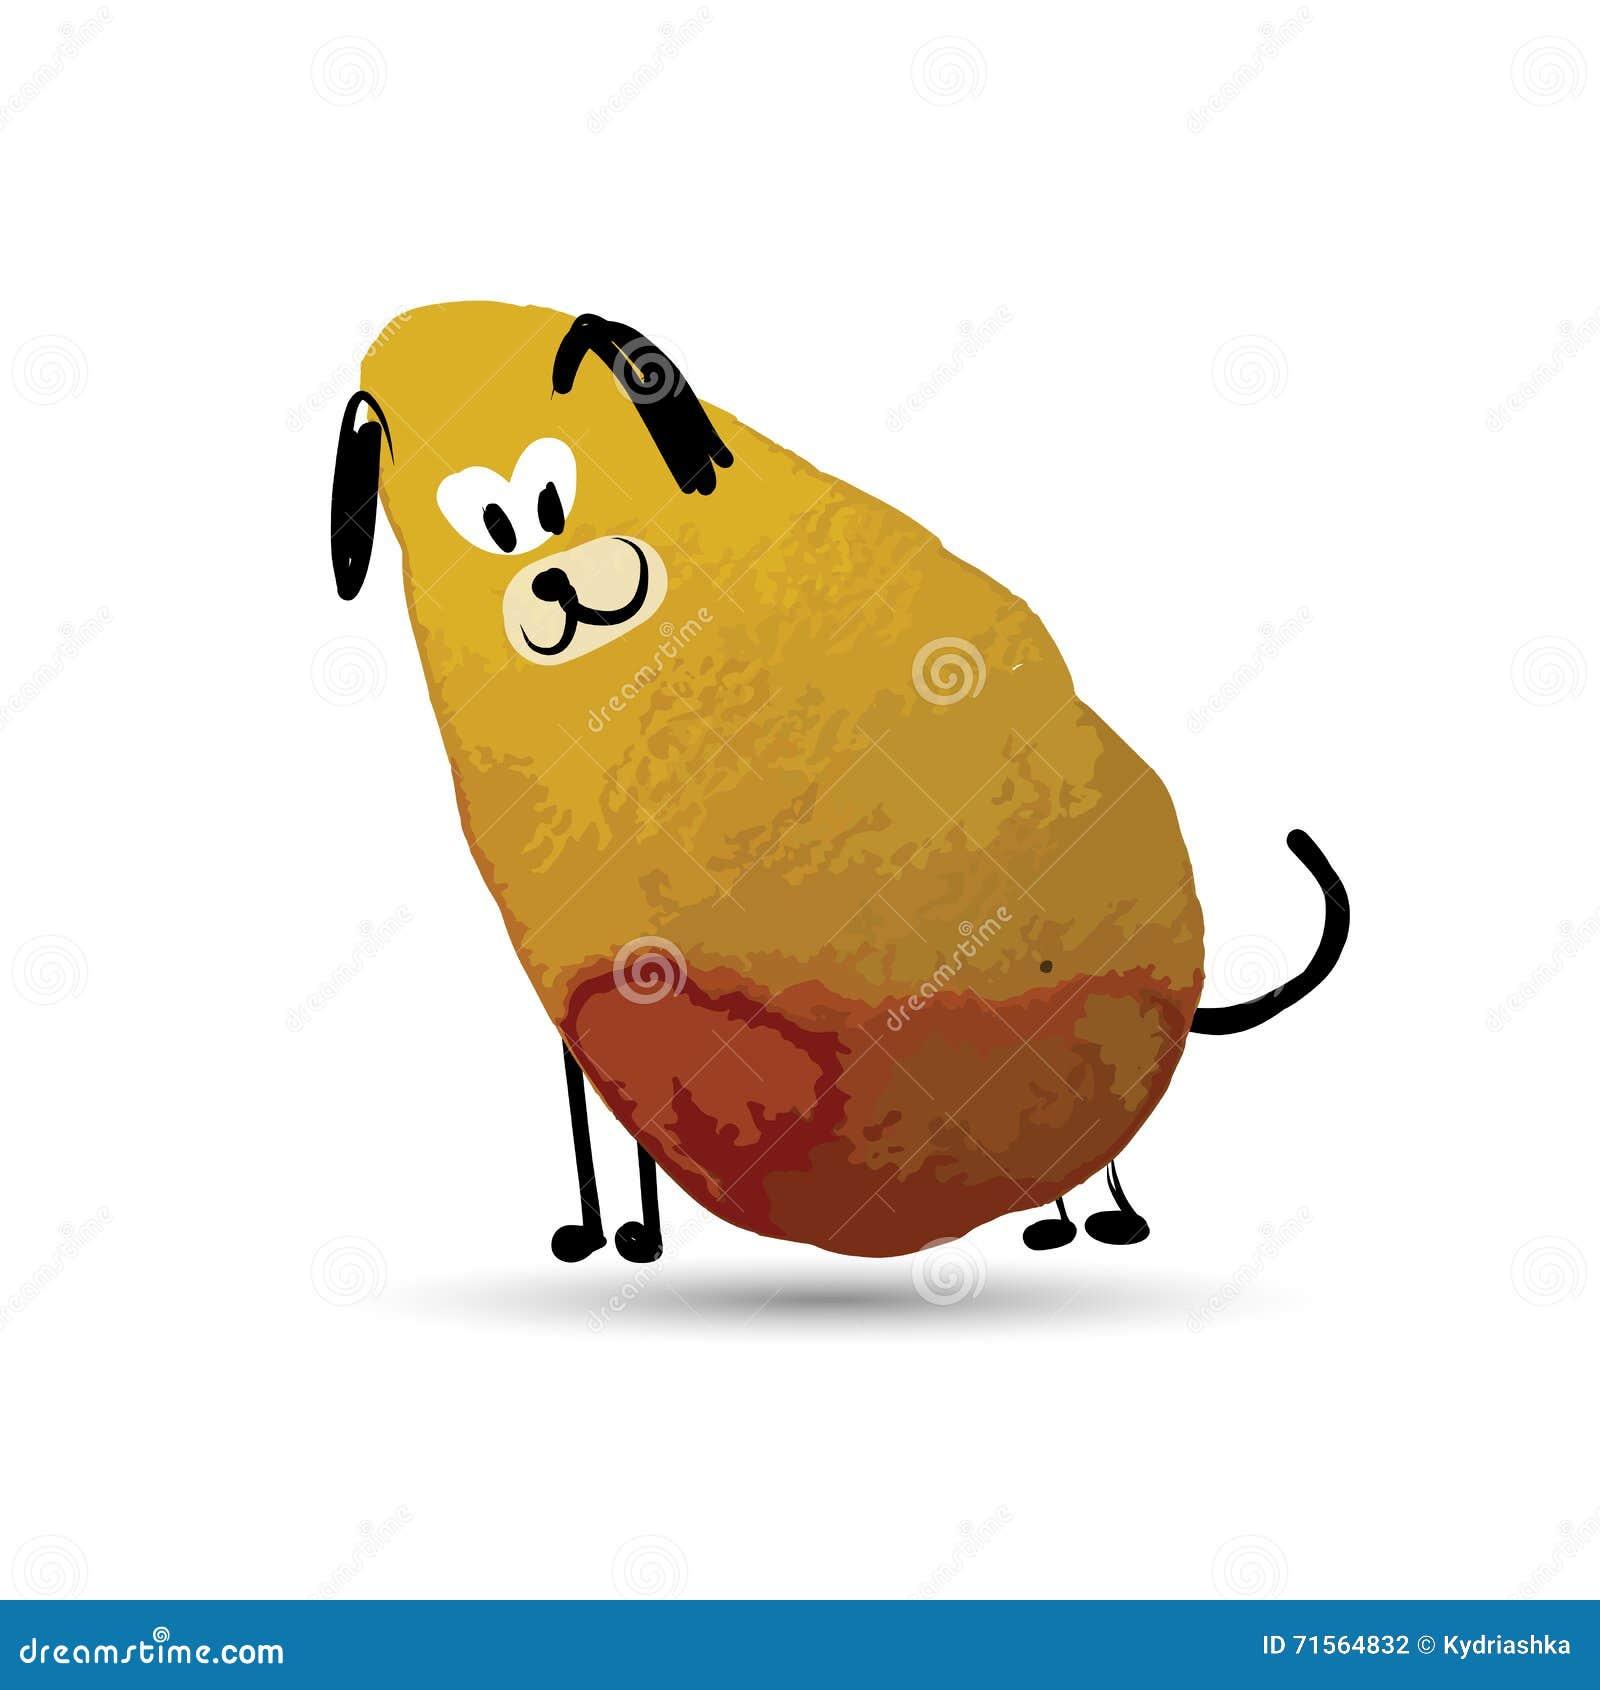 funny dog  sketch for your design vector illustration Hump Back Sofa shape of you solfa syllables